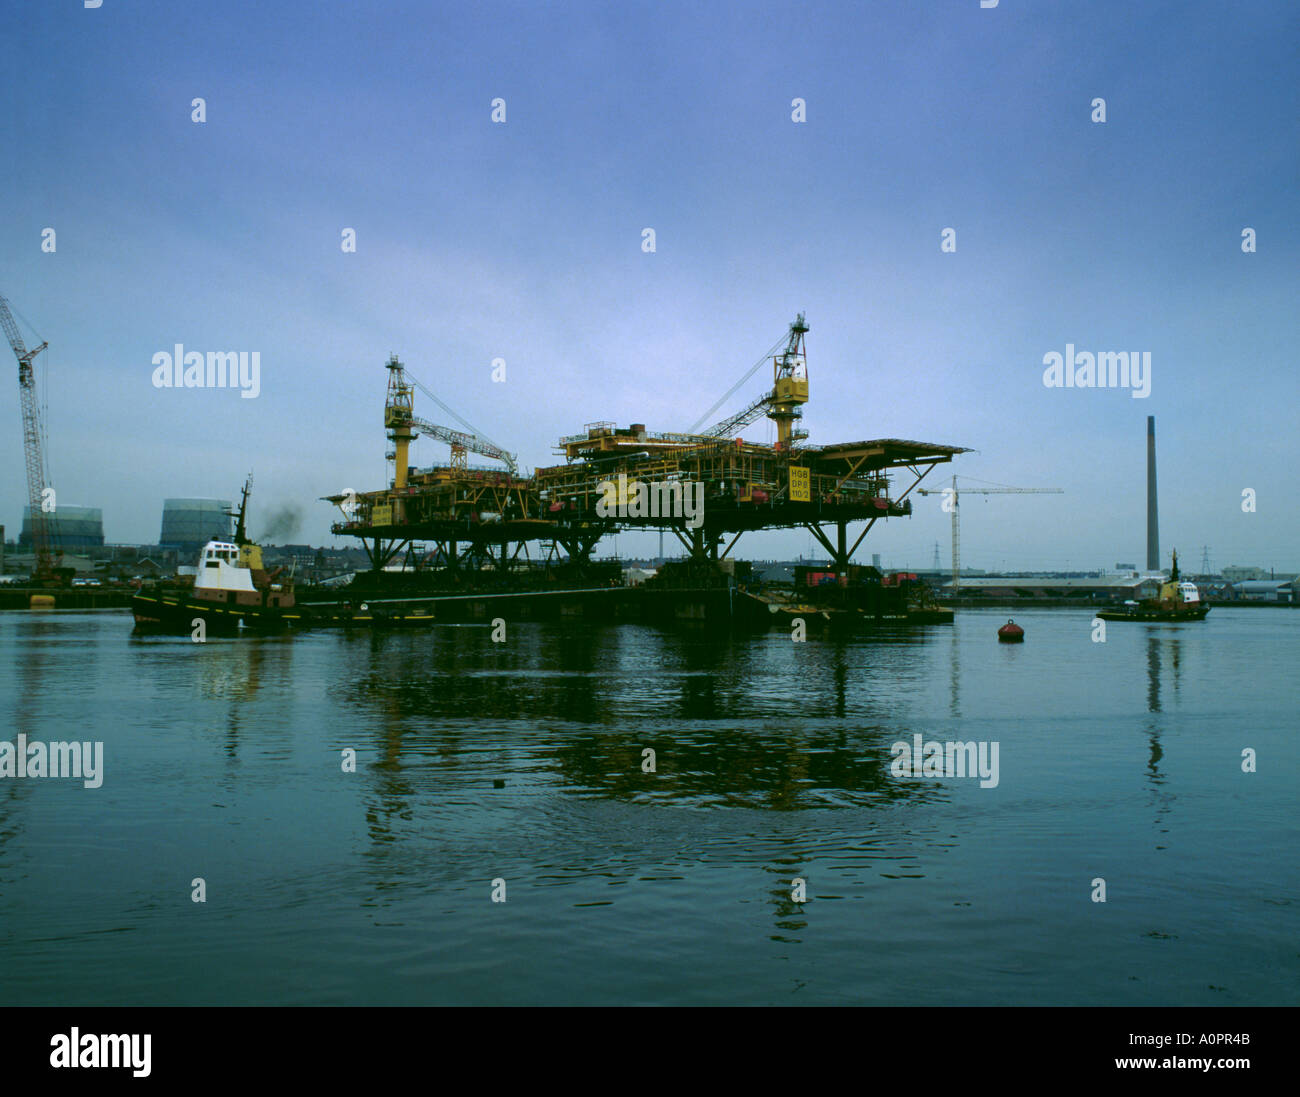 Gas platform loadout, Wallsend, River Tyne, Tyneside, Tyne & Wear, England, UK. Stock Photo